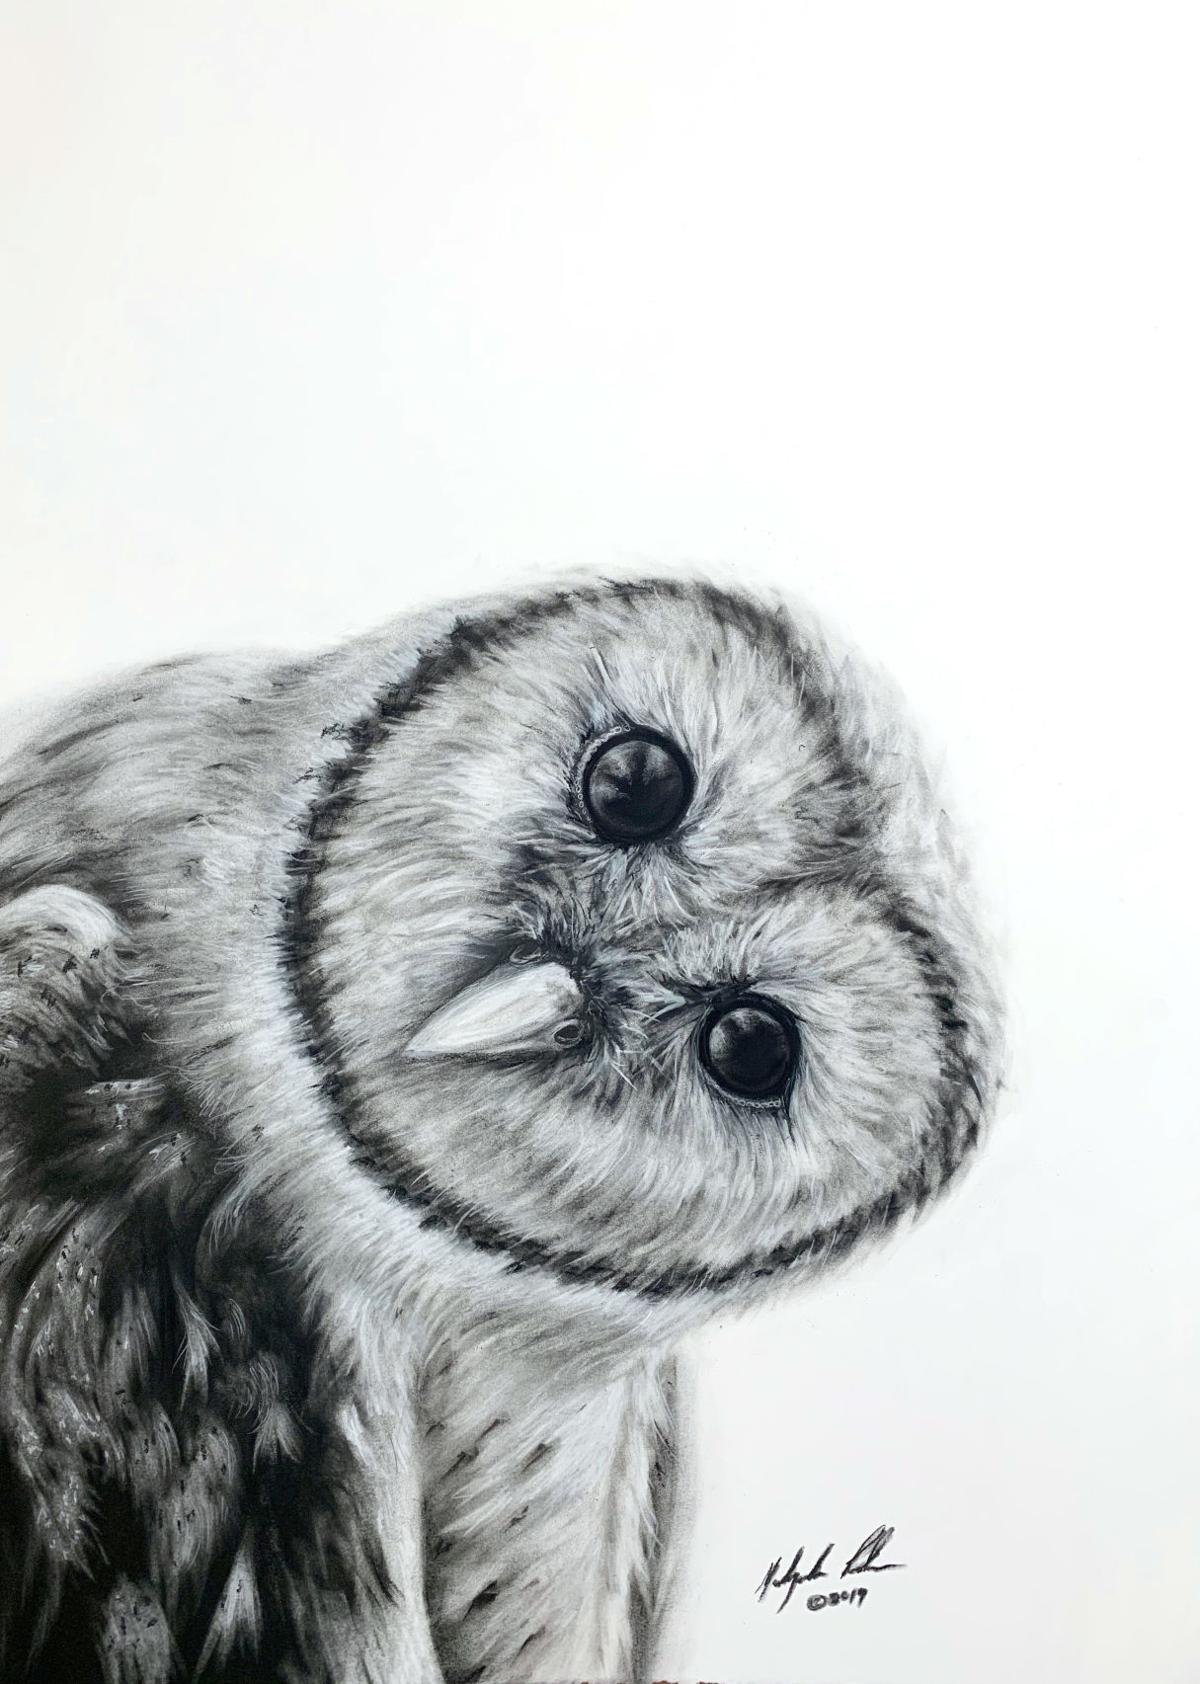 190704 QA %22Who%22 MaLynda Poulsen owl.jpg